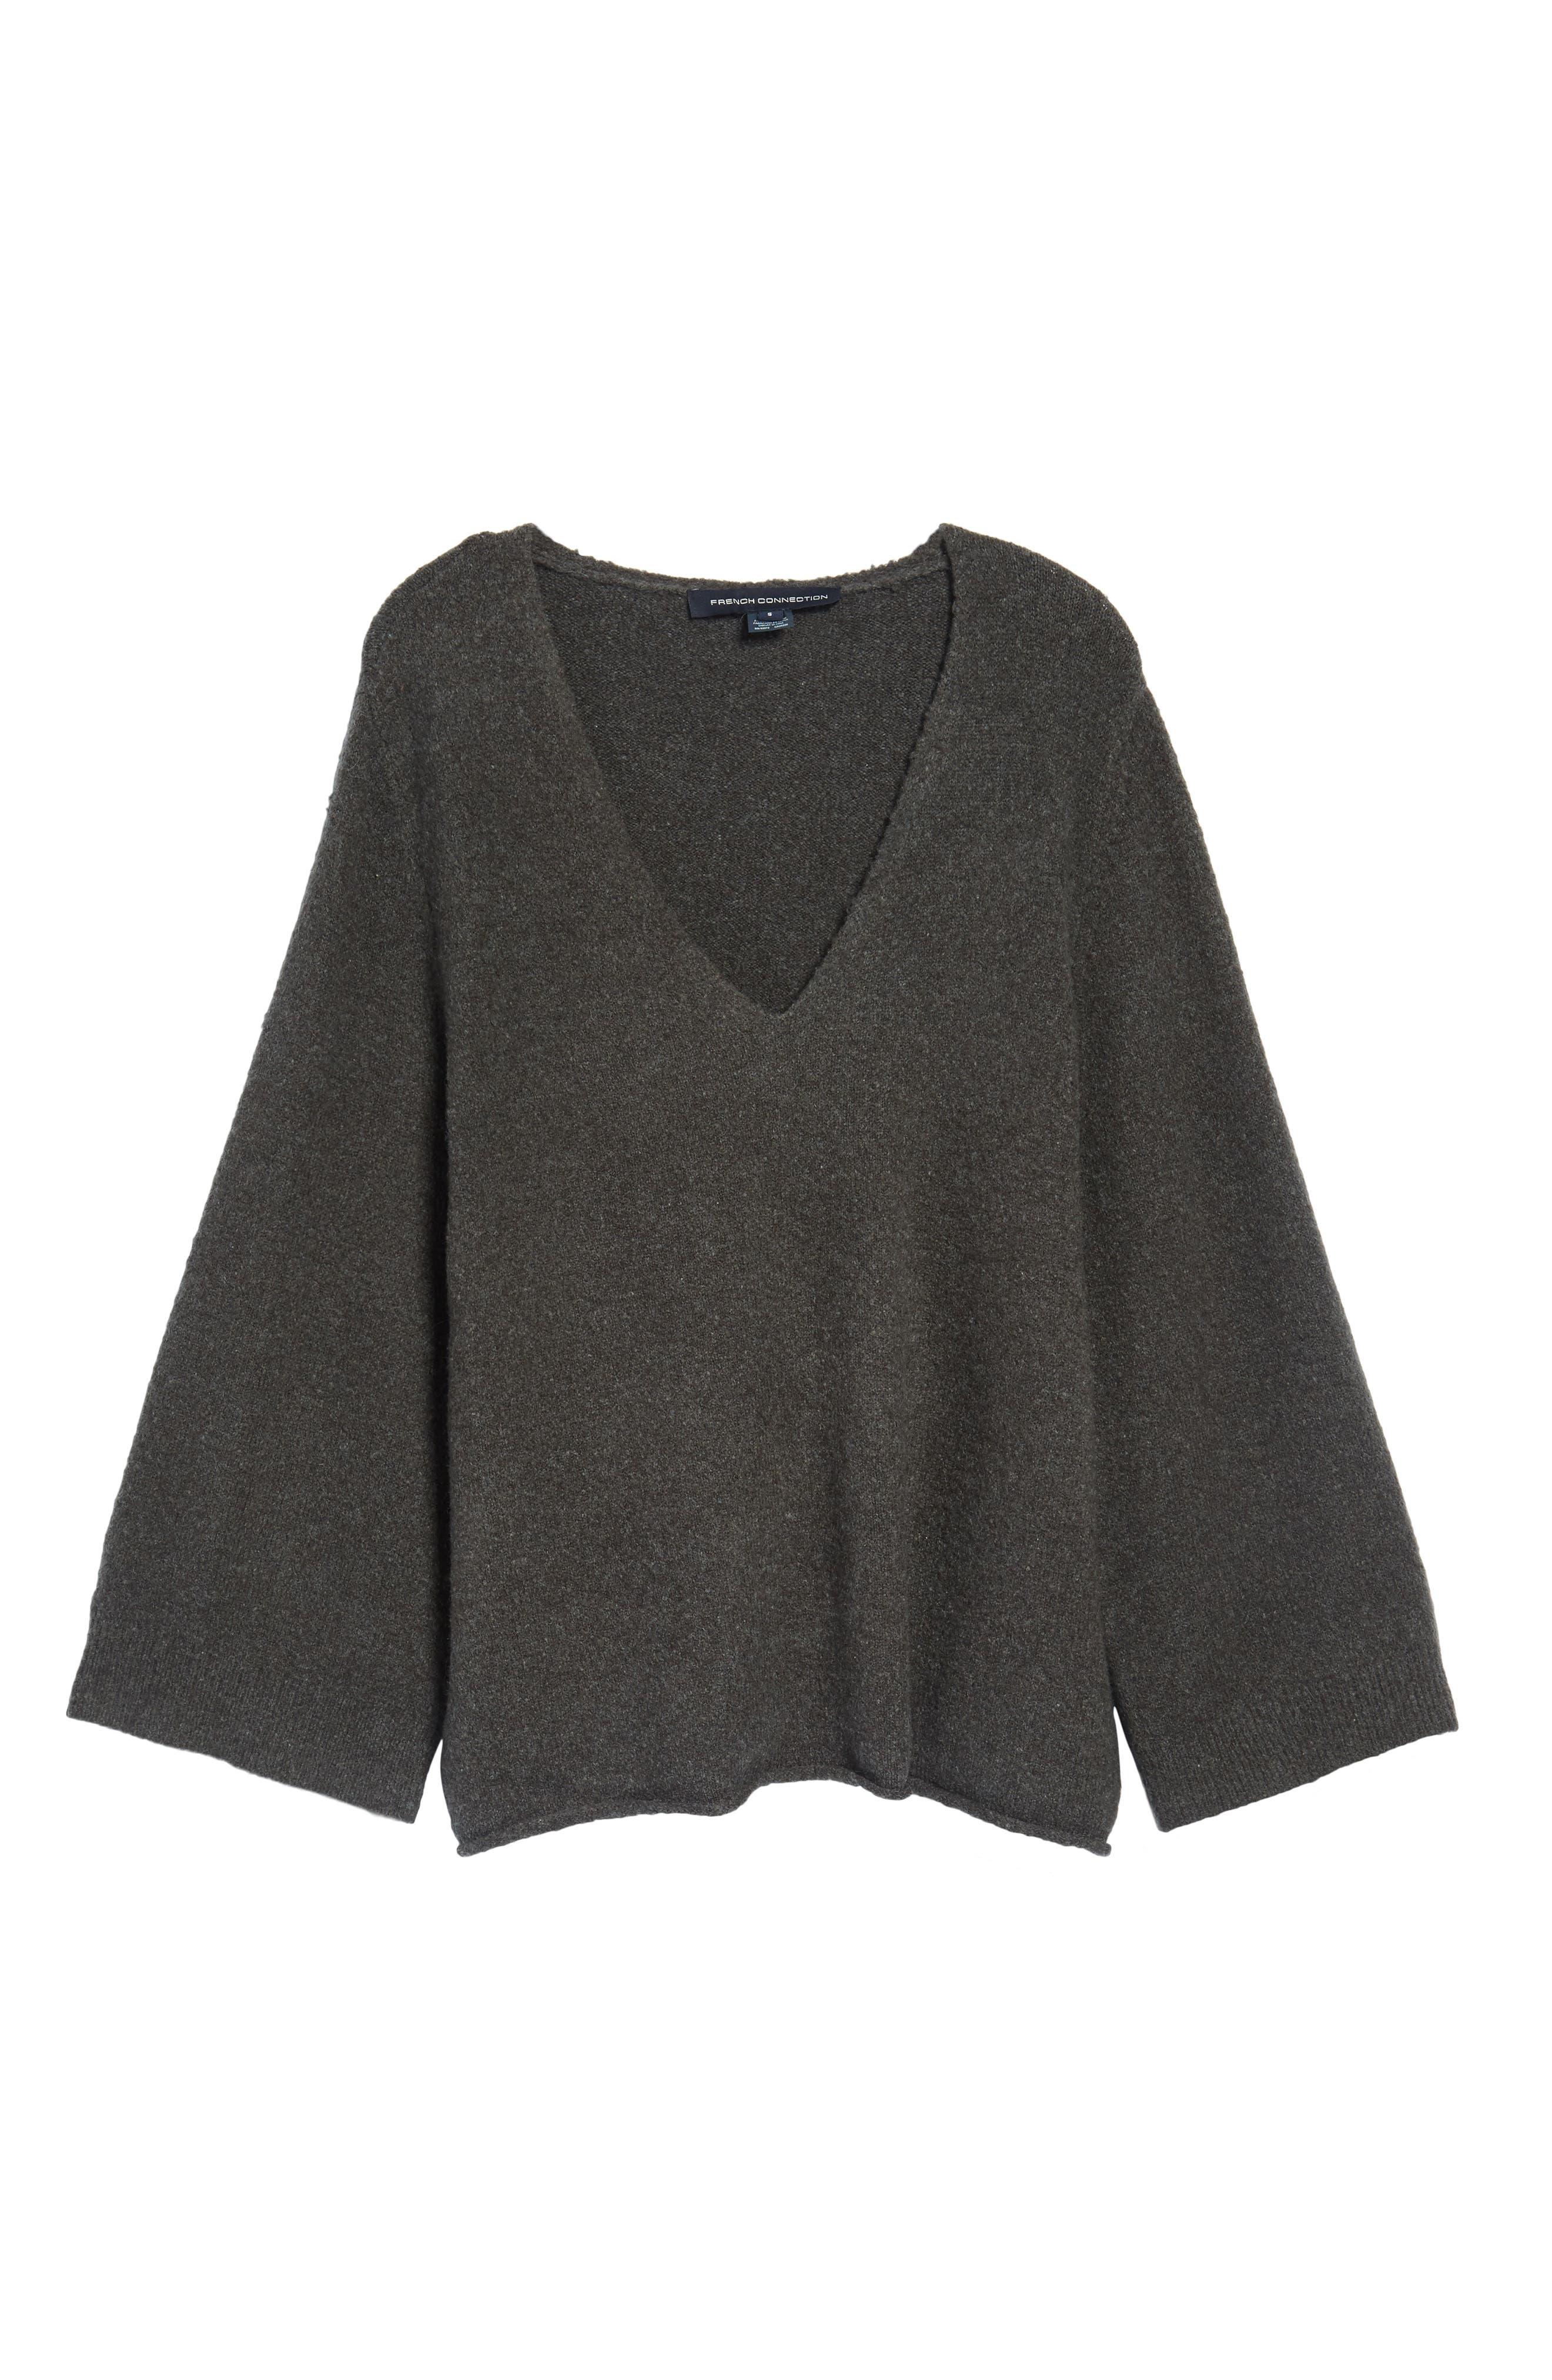 Urban Flossy Sweater,                             Alternate thumbnail 23, color,